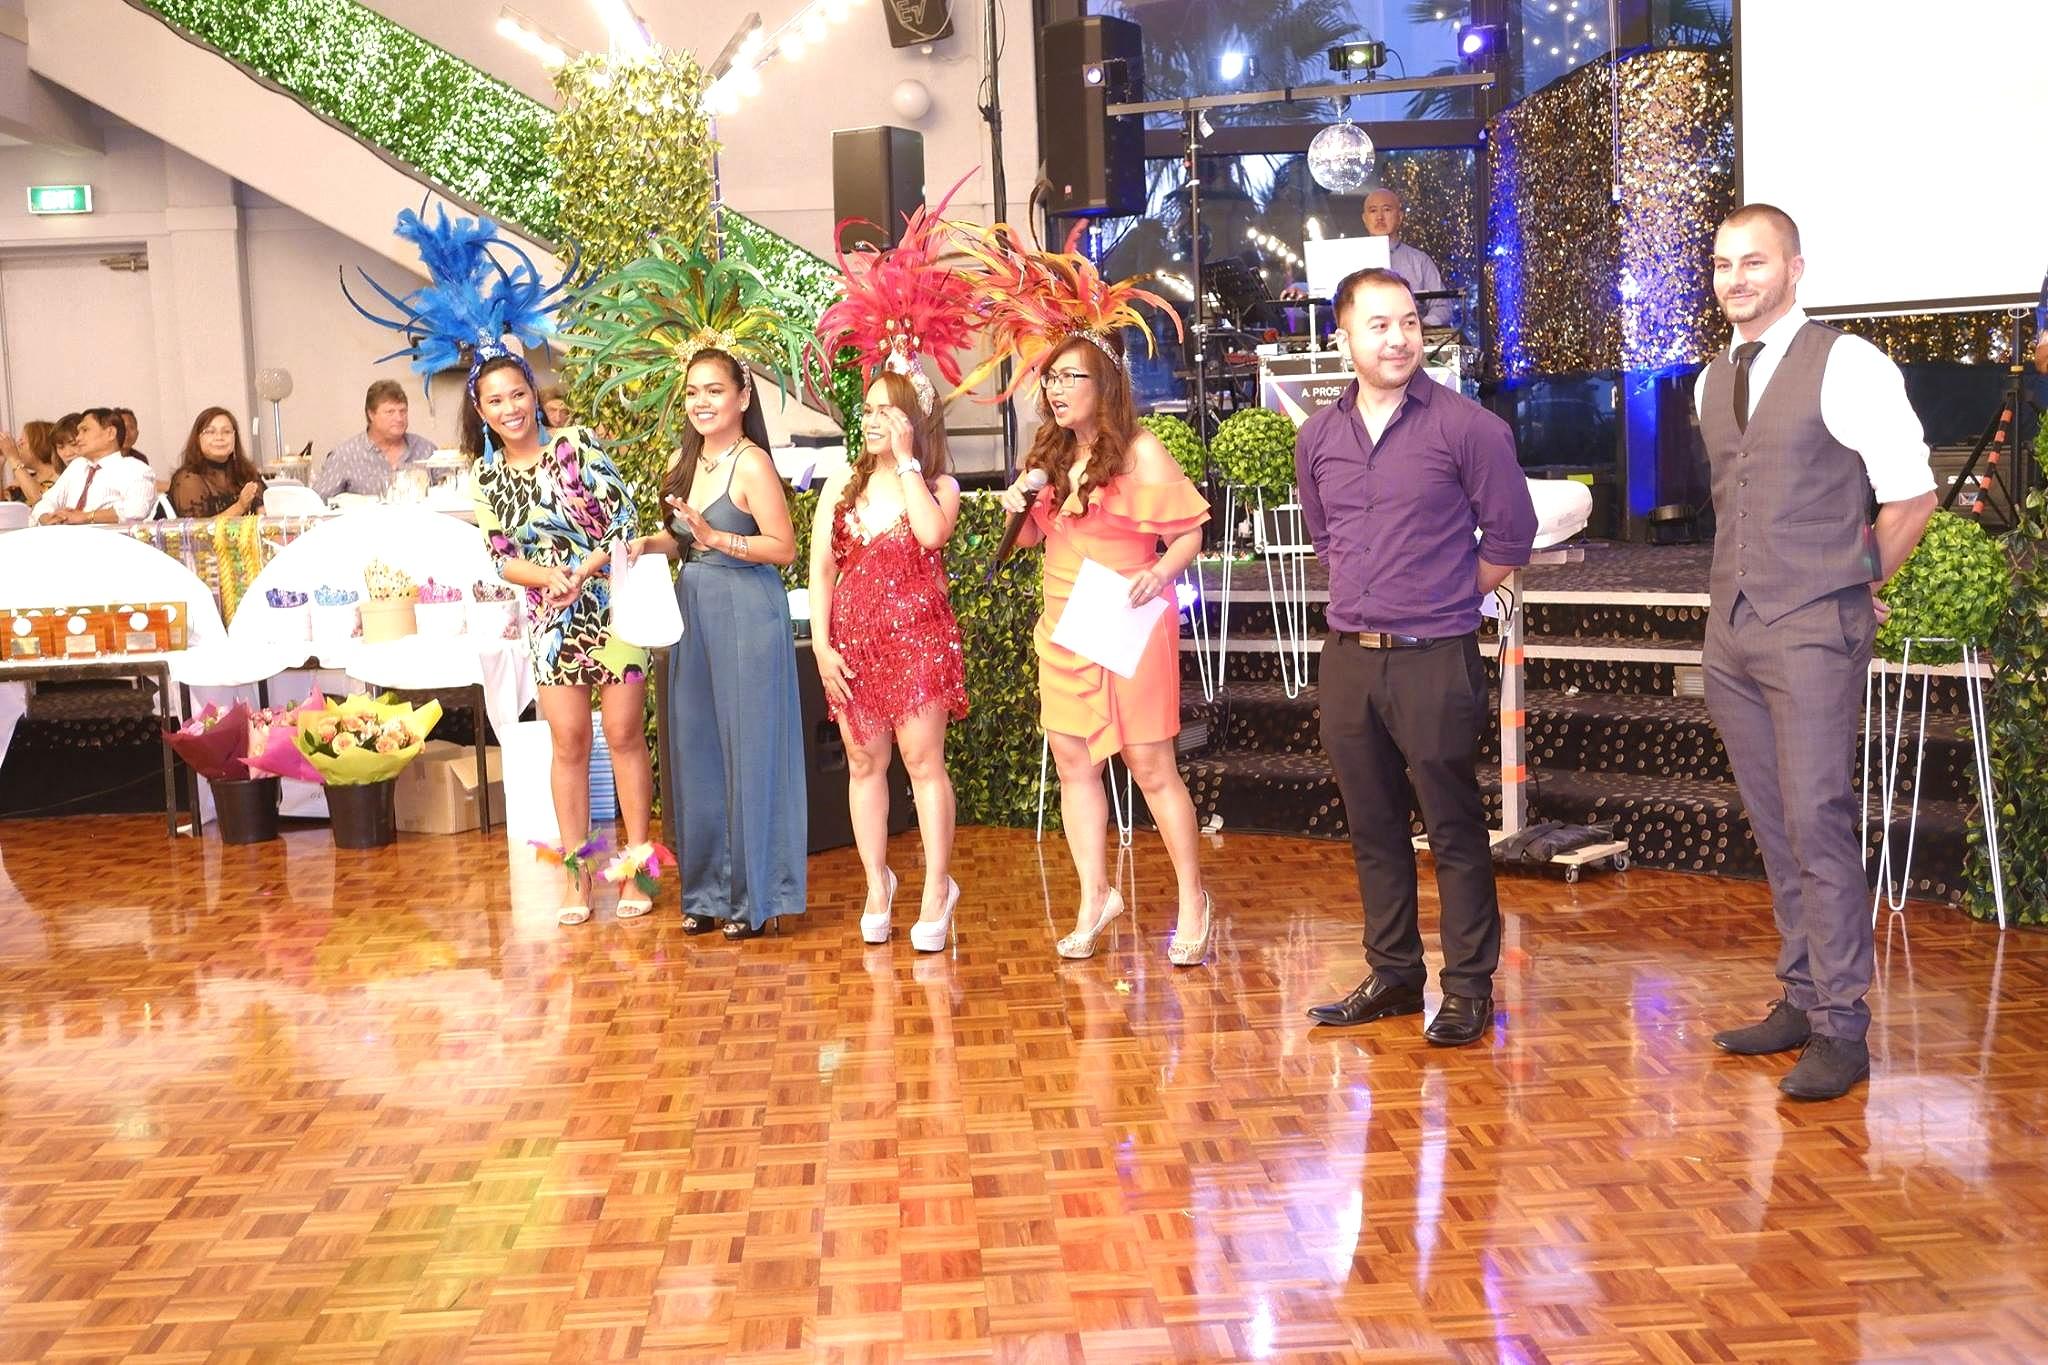 smad-team-2019-australia-charity-event-dinner-dance-event-philippines-melbourne.jpg